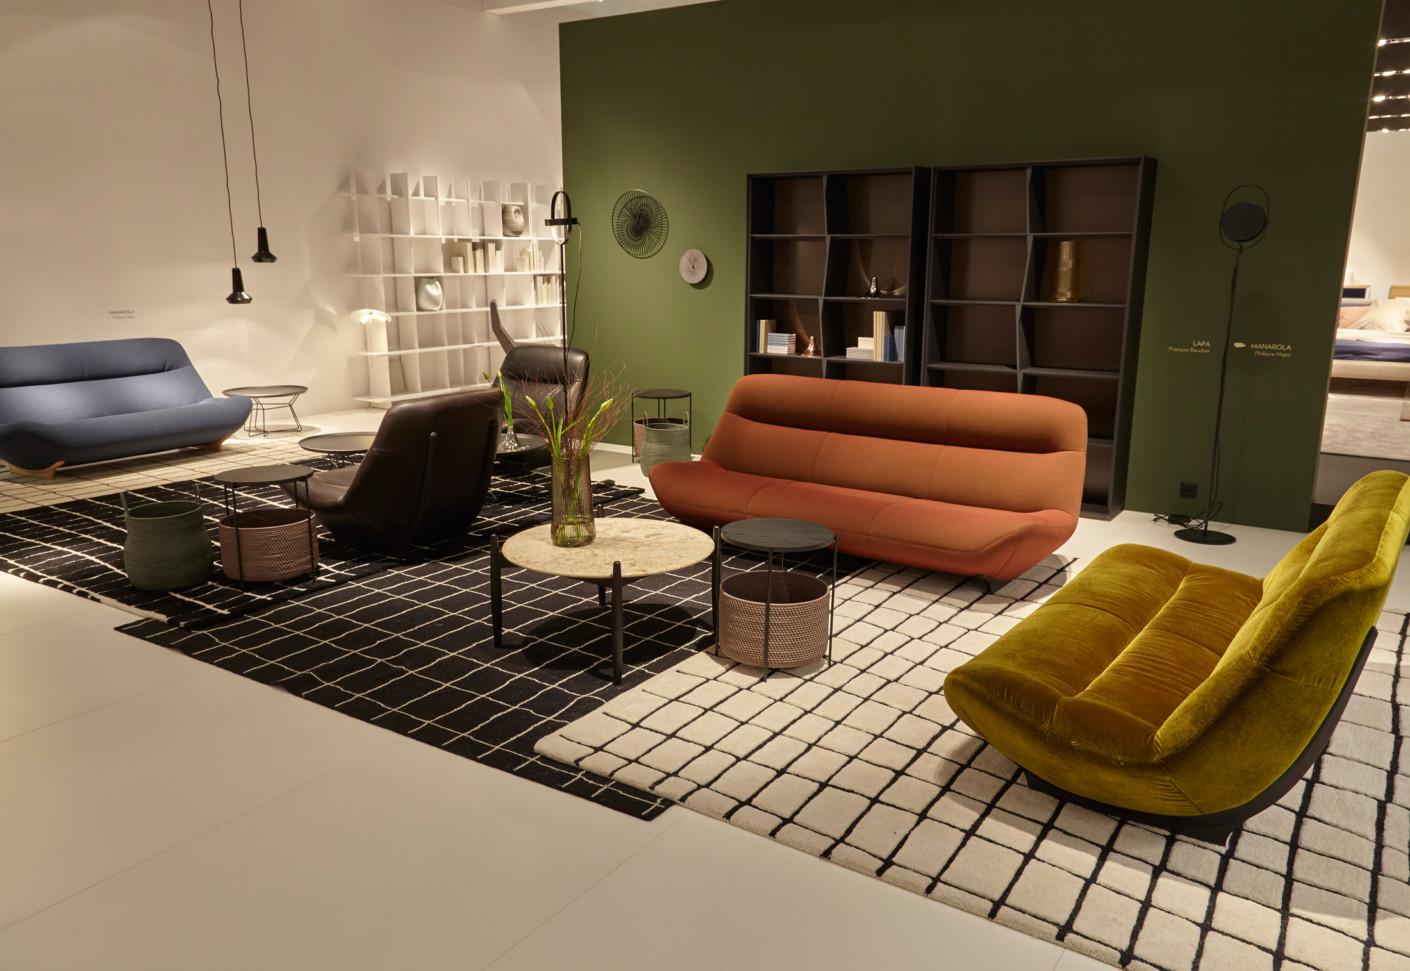 manarola 2 sitzer von ligne roset stylepark. Black Bedroom Furniture Sets. Home Design Ideas